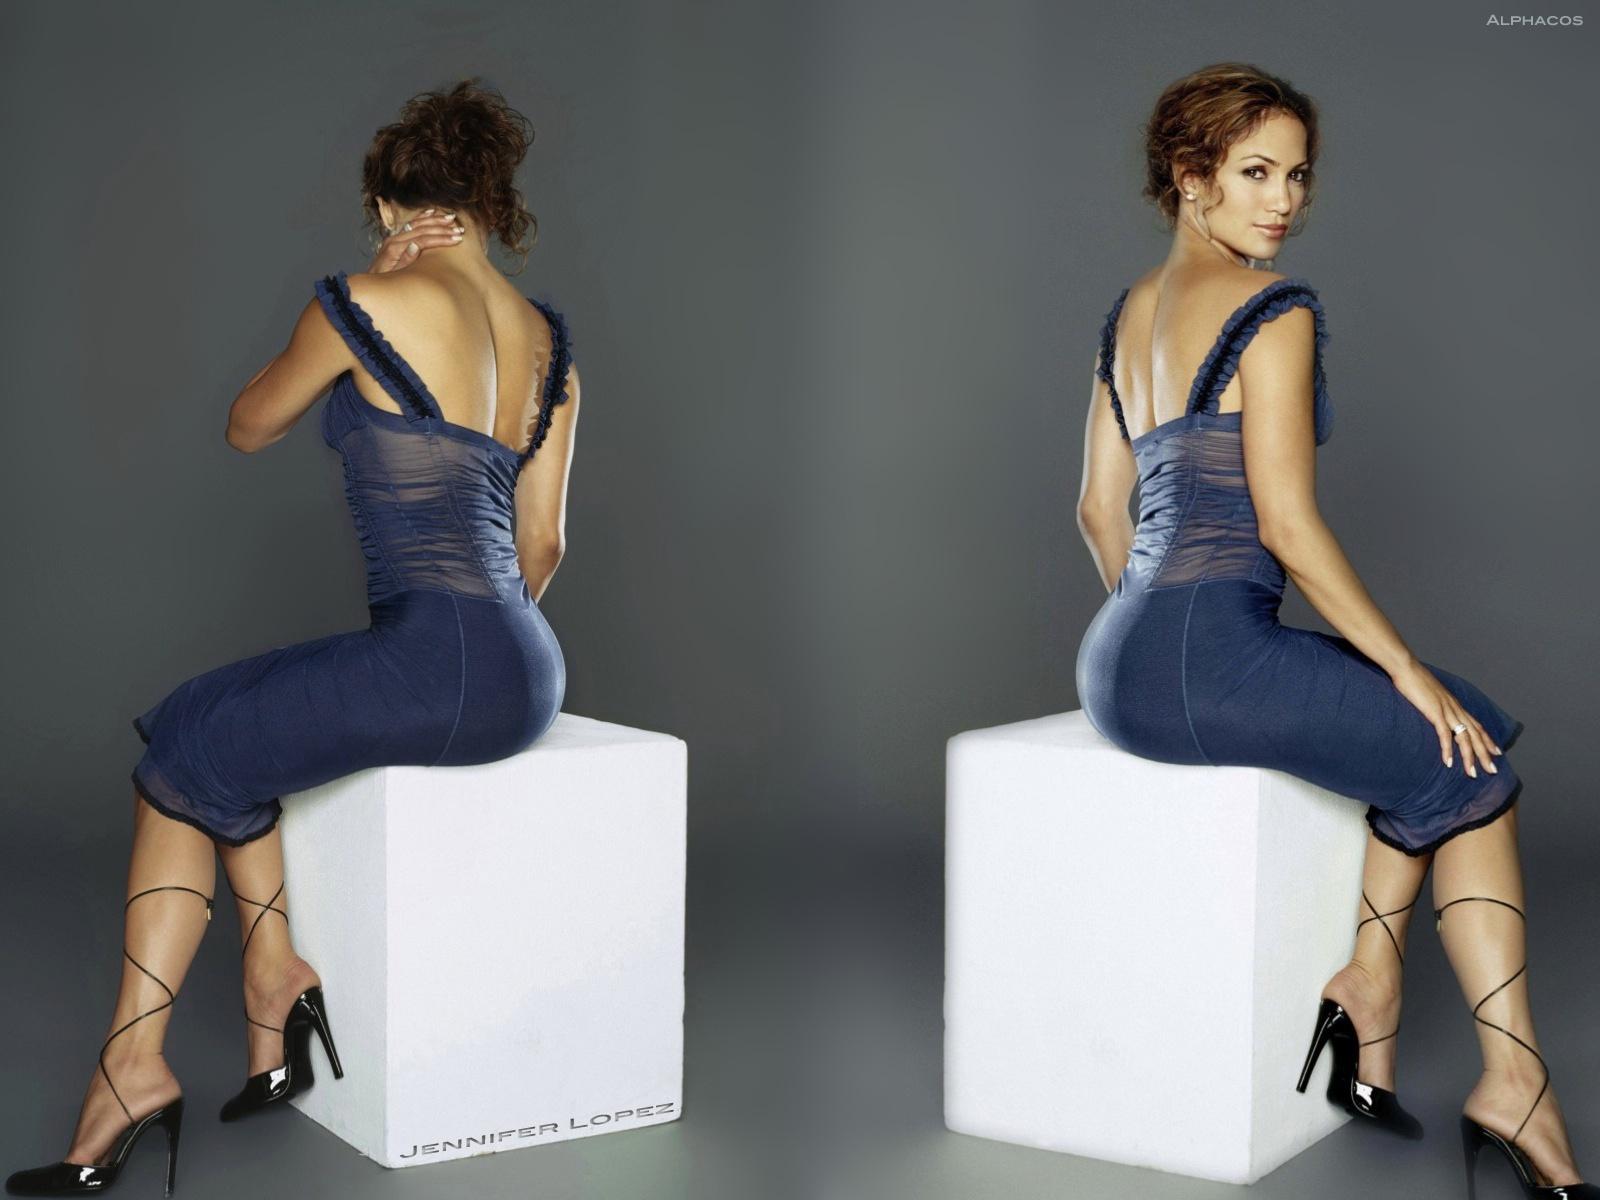 JLo   Jennifer Lopez Wallpaper 28640003 1600x1200